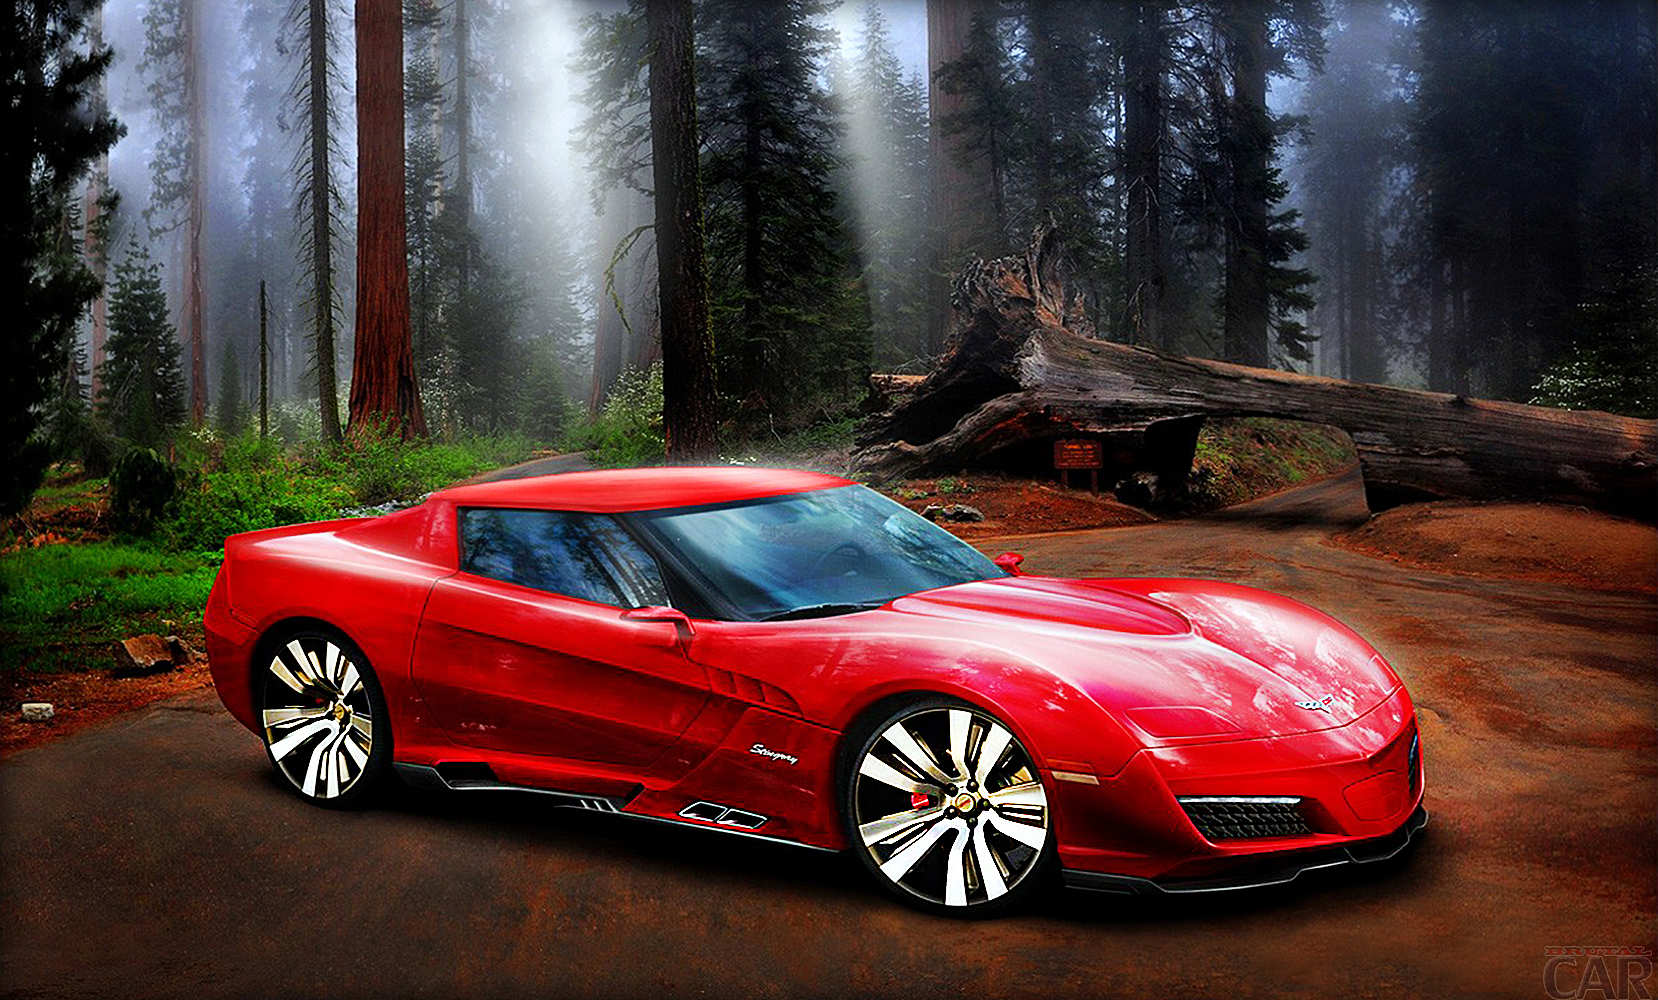 Carro In English >> Papel de parede Chevrolet. Assista on-line grande papel de parede carros novos para iOS. Chevrolet.